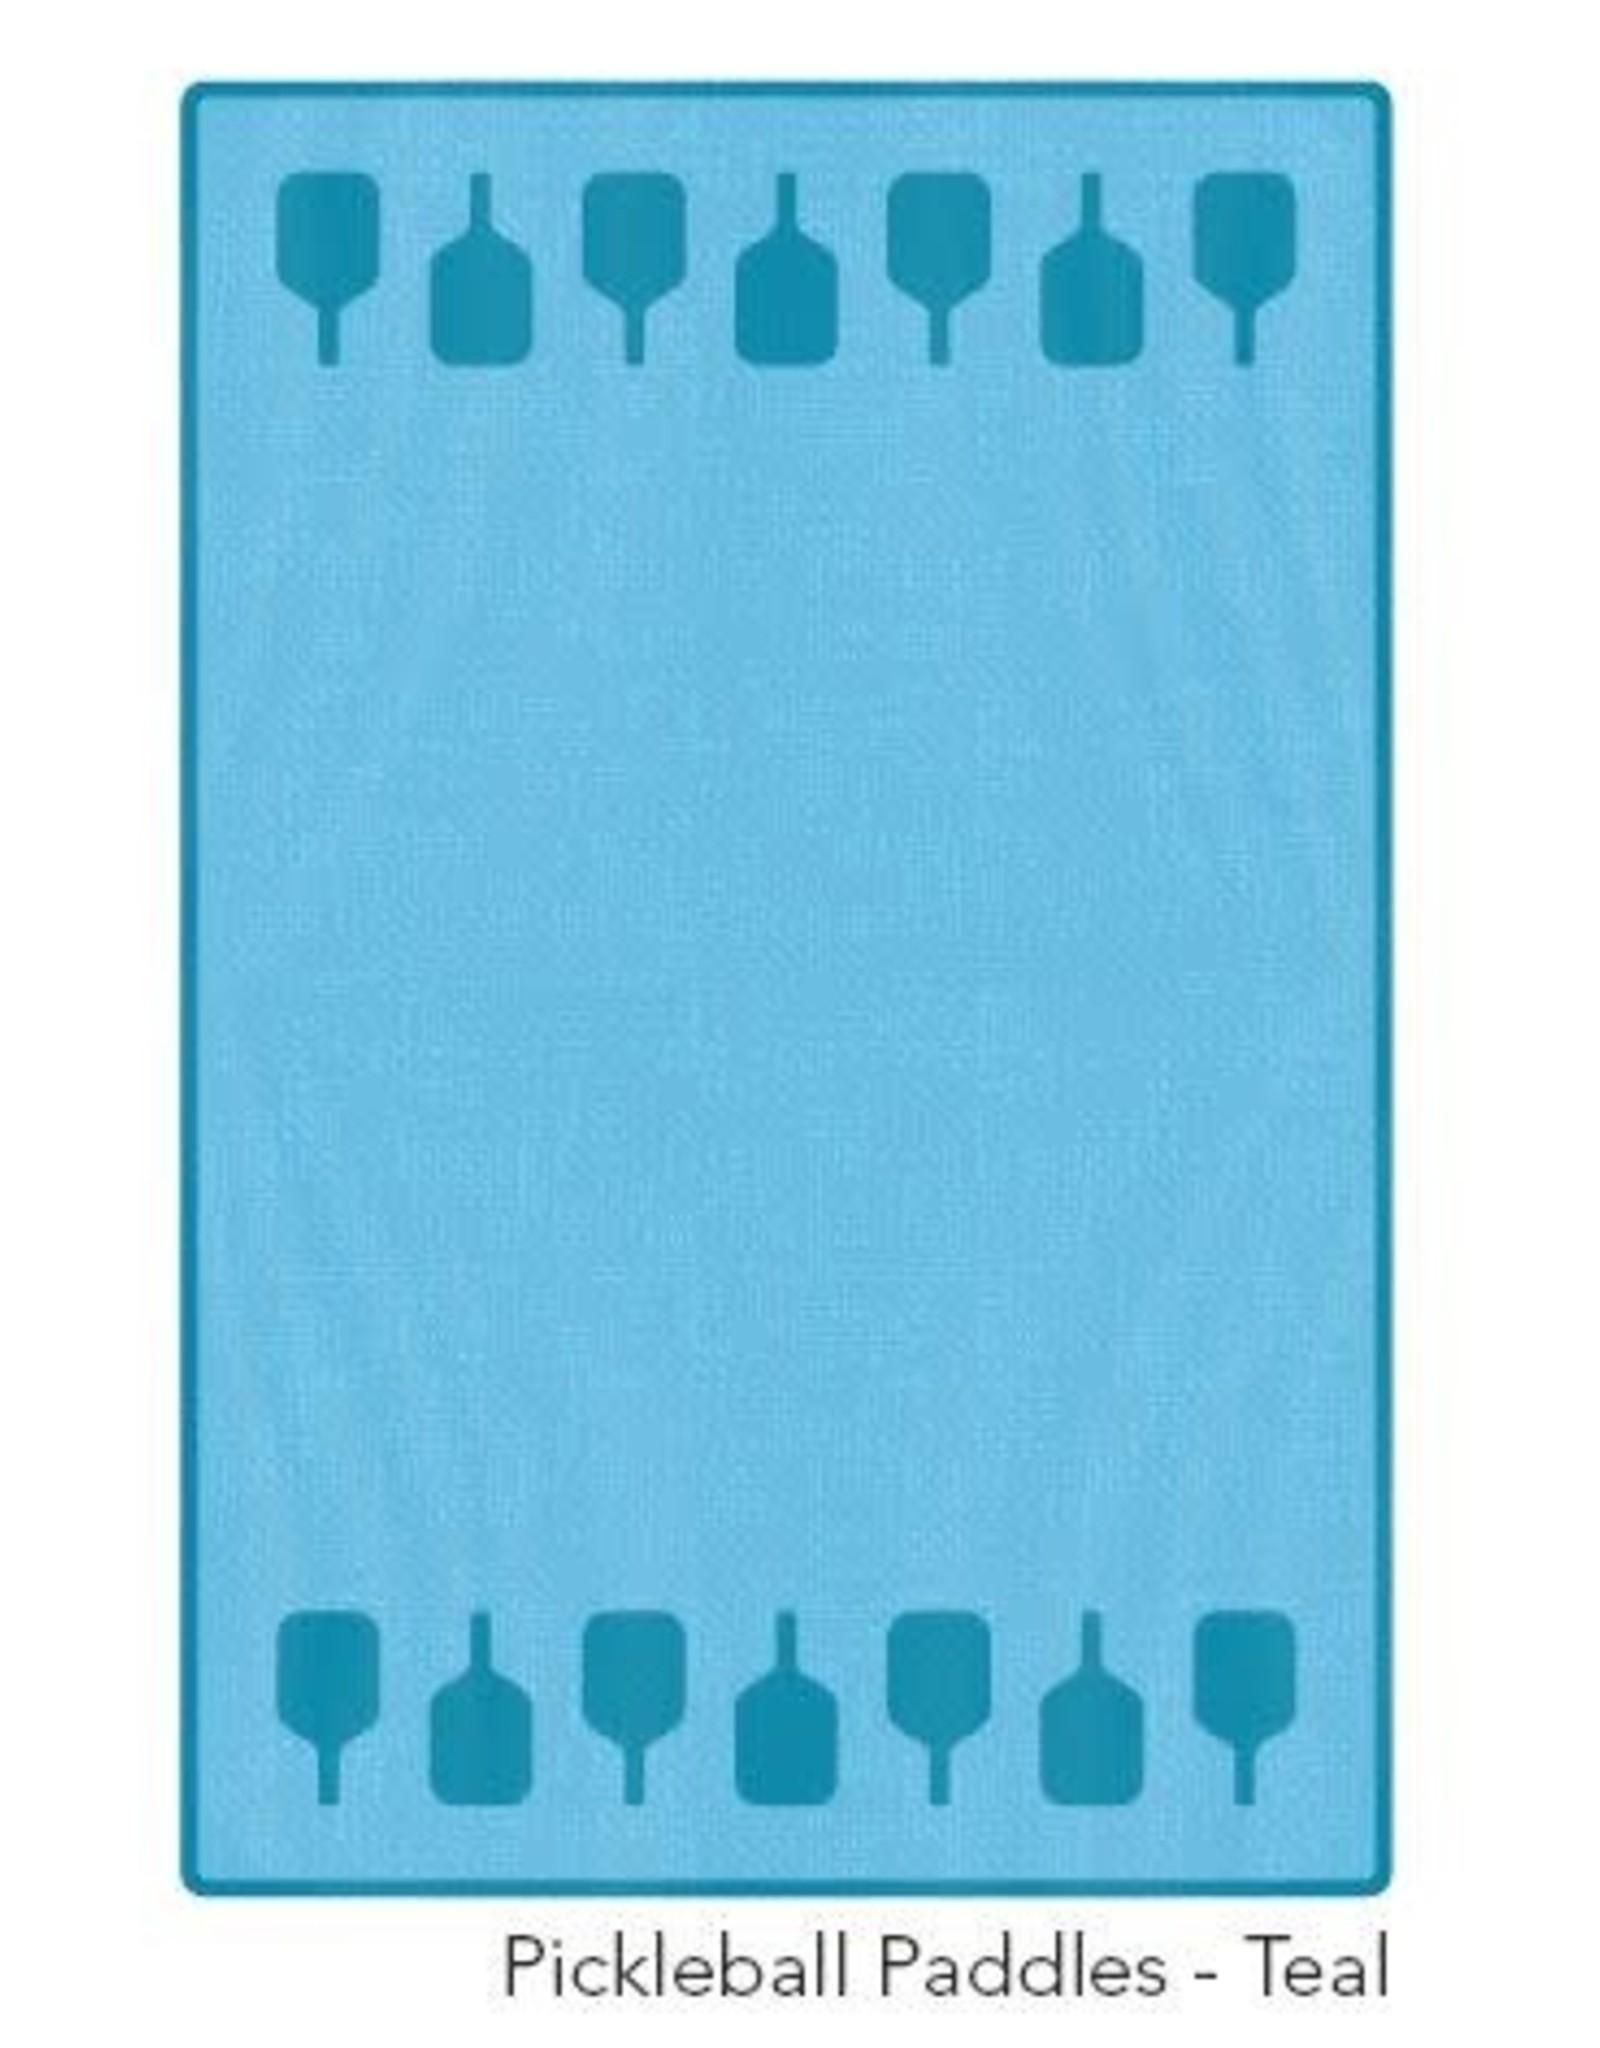 Racquet Inc Pickleball Paddles Towel (Teal)